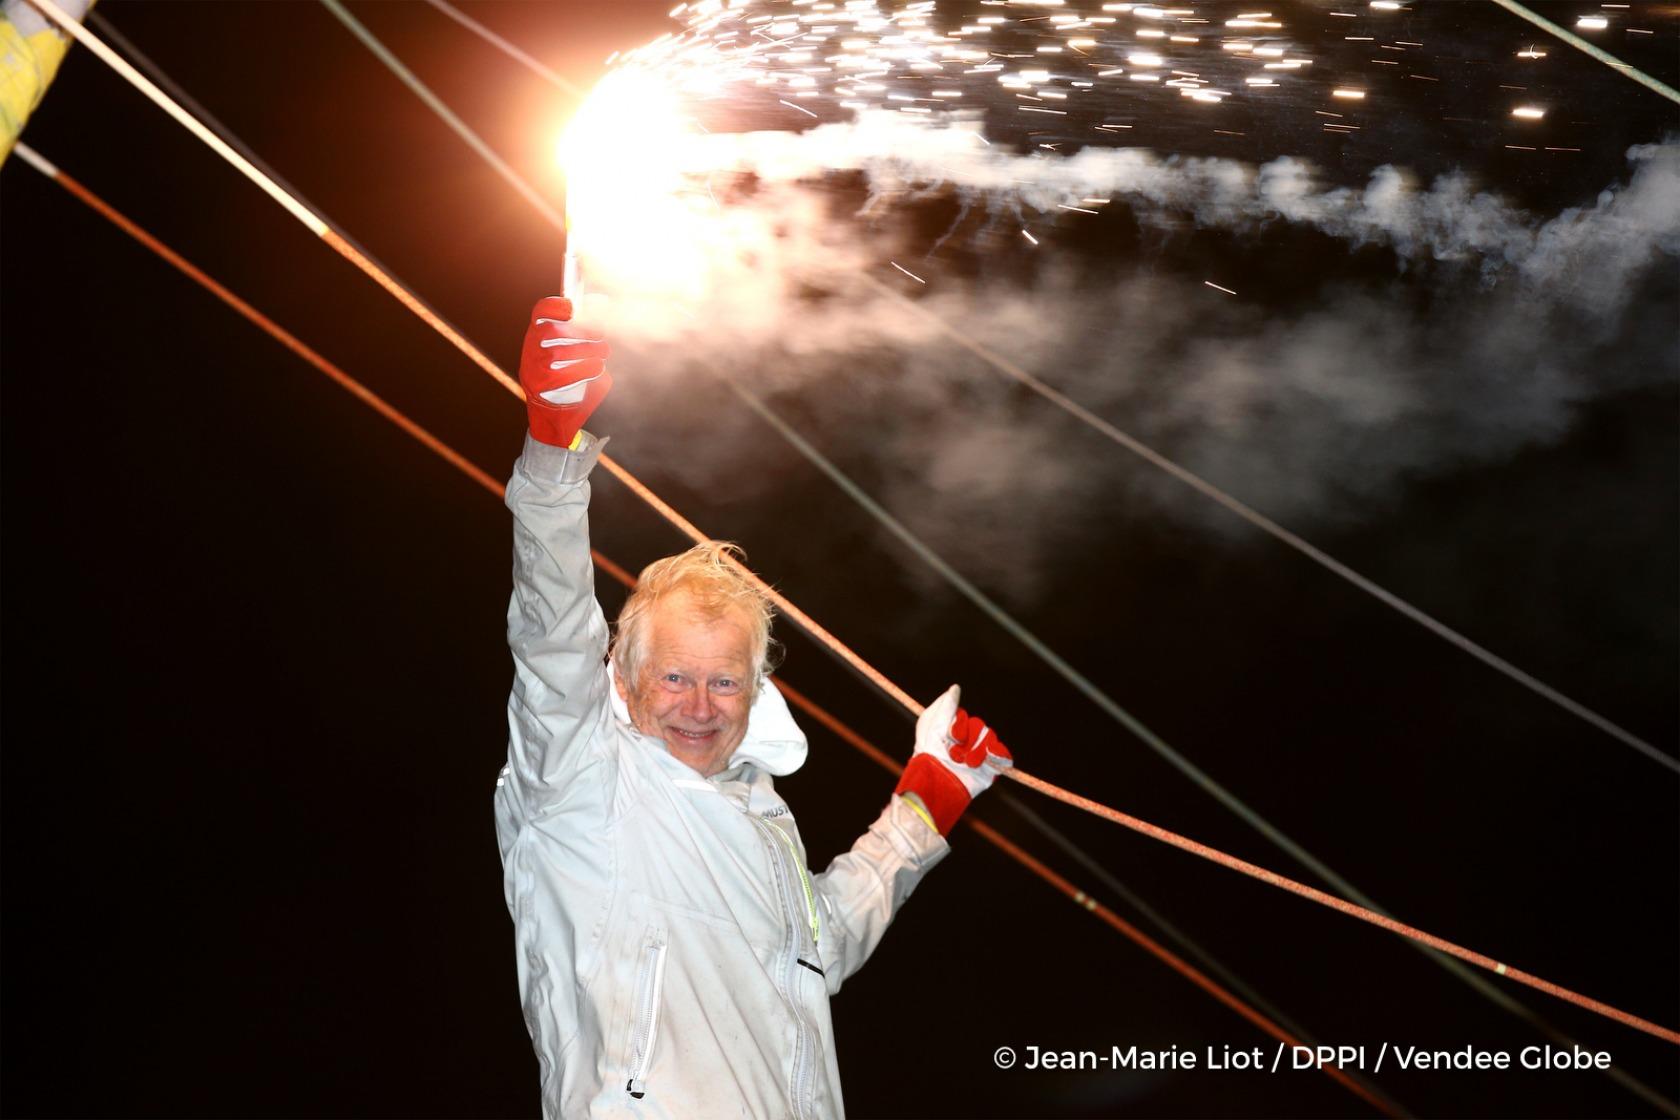 celebration-with-flares-during-finish-ar